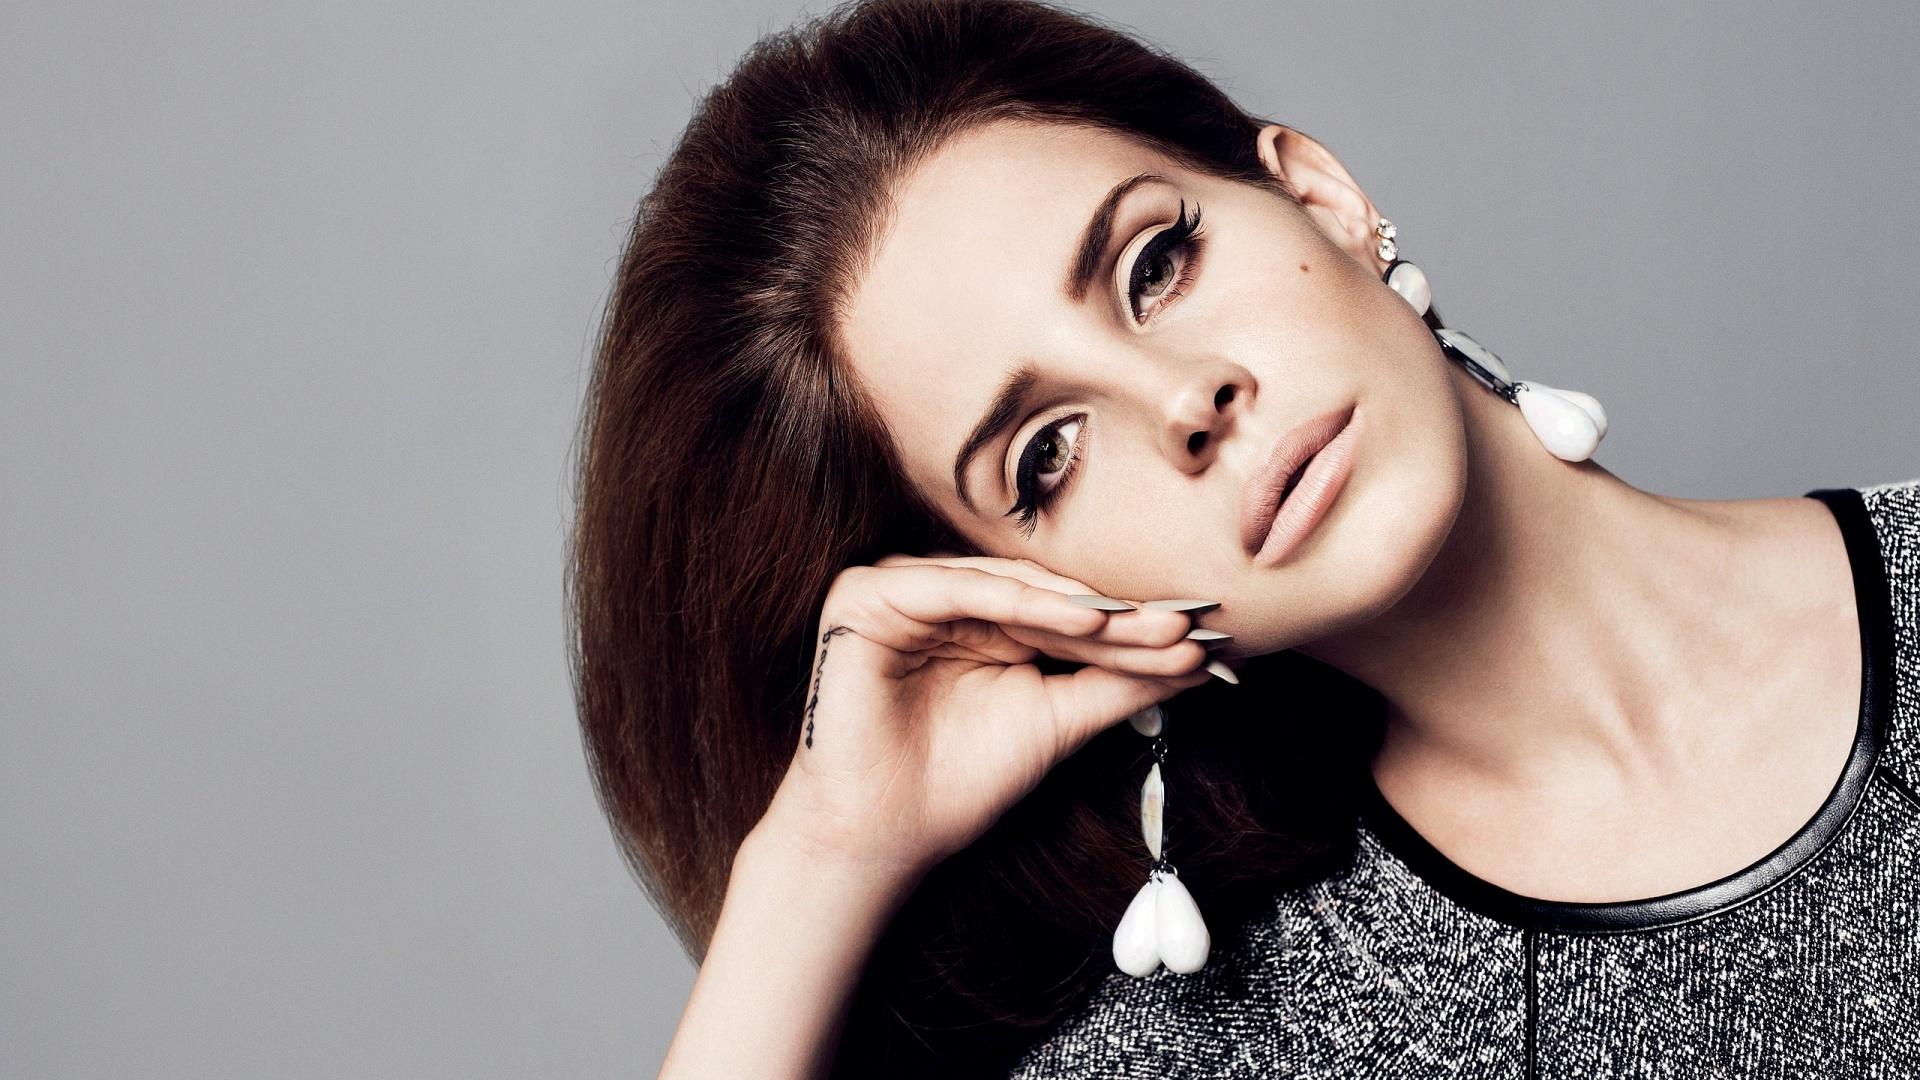 Best Lana Del Rey Wallpapers Conversations About Her